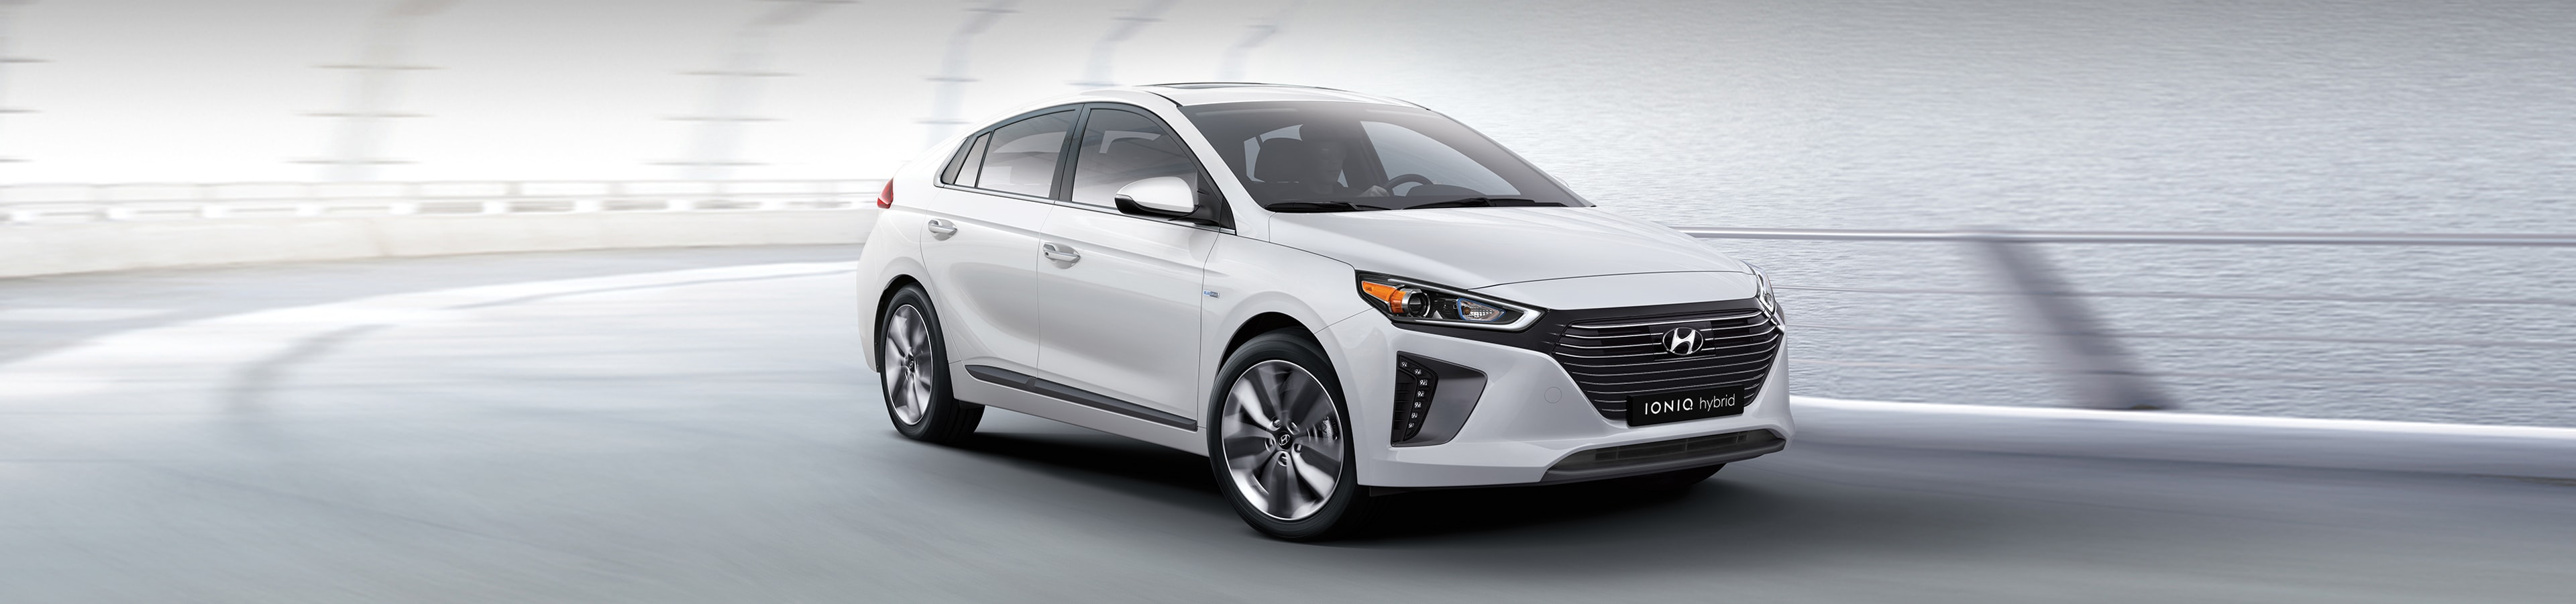 2018 Hyundai IONIQ Hybrid SE vs Toyota Prius Technology vs Ford C